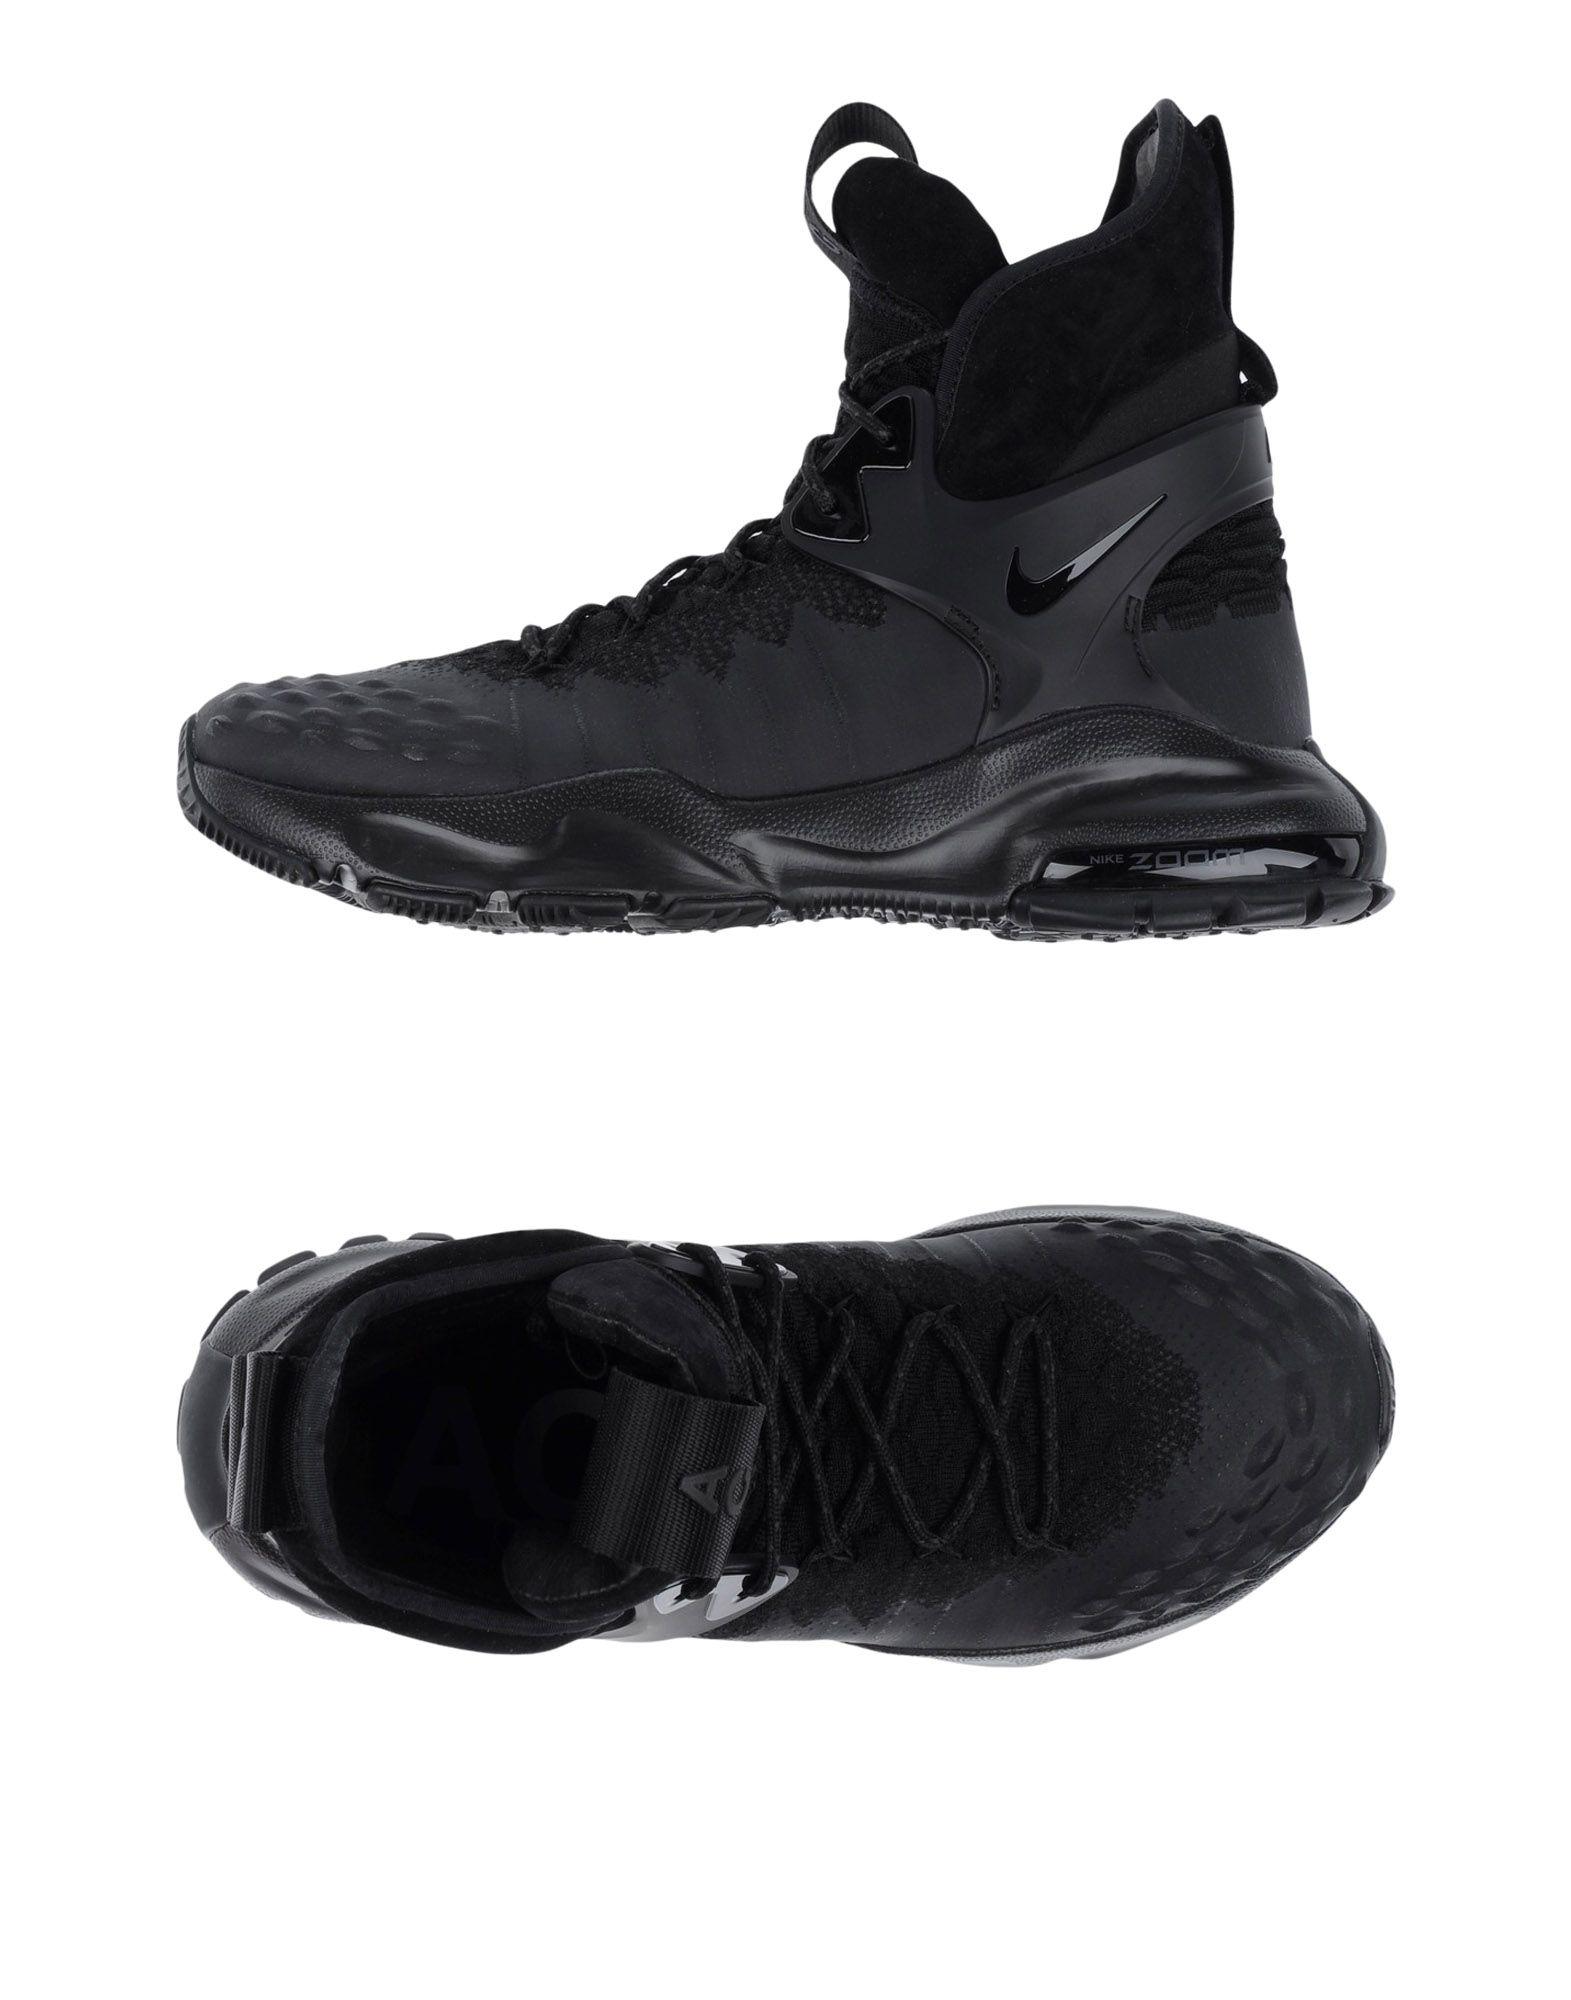 Nike Sneakers Sneakers - Men Nike Sneakers Nike online on  Australia - 11247065VJ f93865